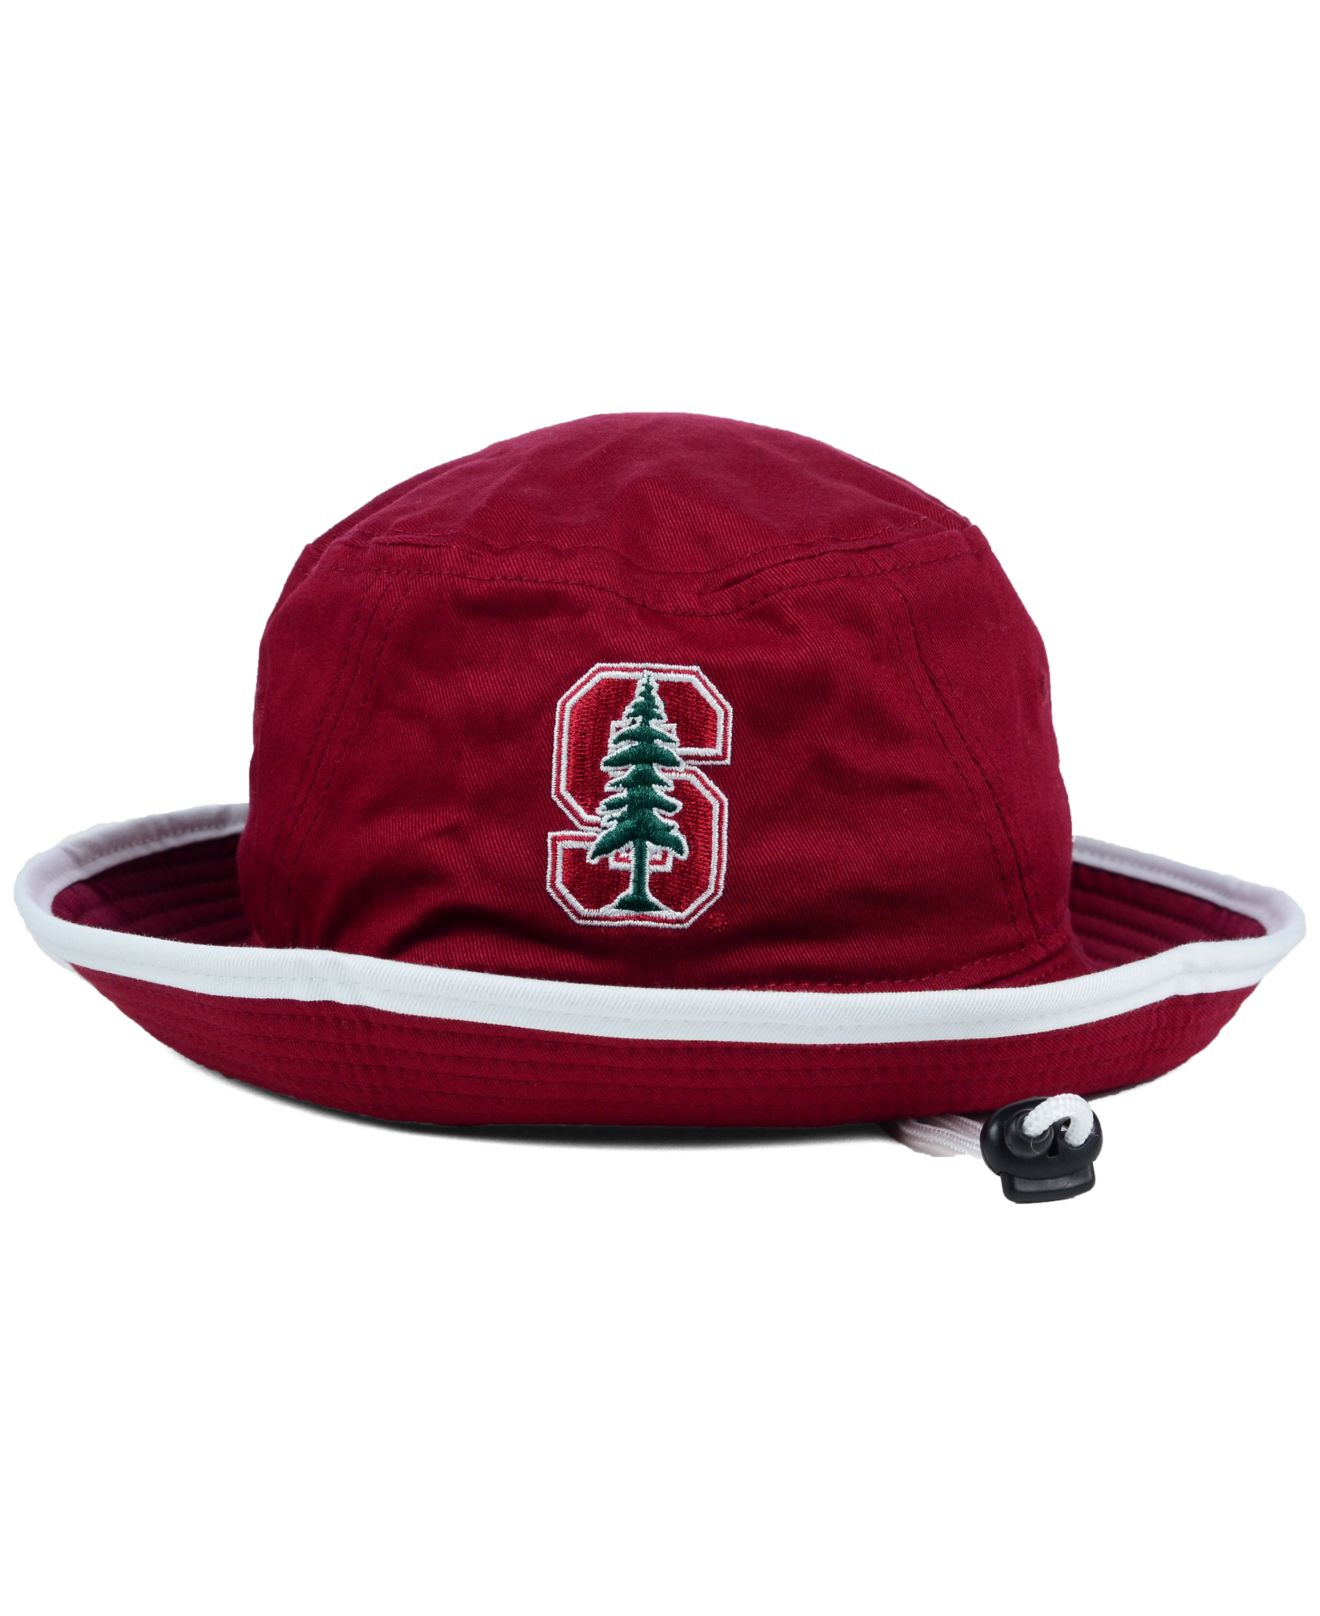 best website 15446 ef201 ... cheap lyst ktz stanford cardinal tip bucket hat in red for men 465a6  8426b